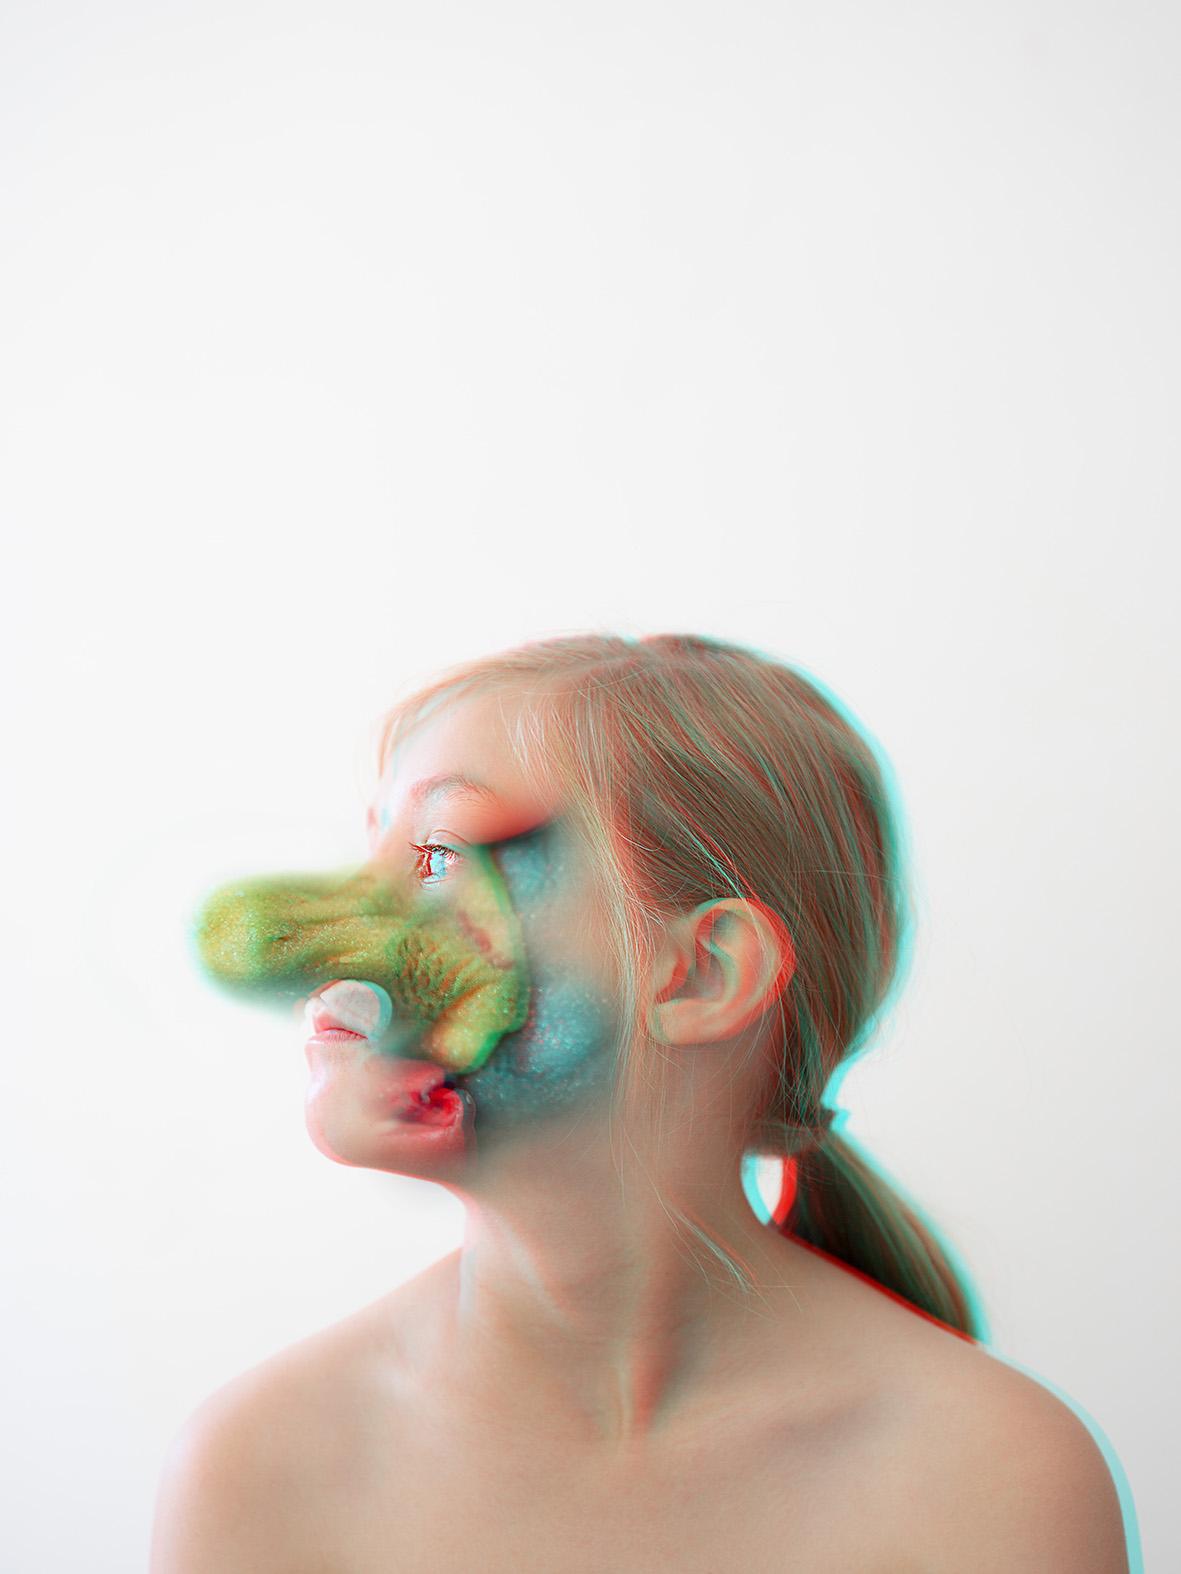 Anaglyph photographic montage portrait